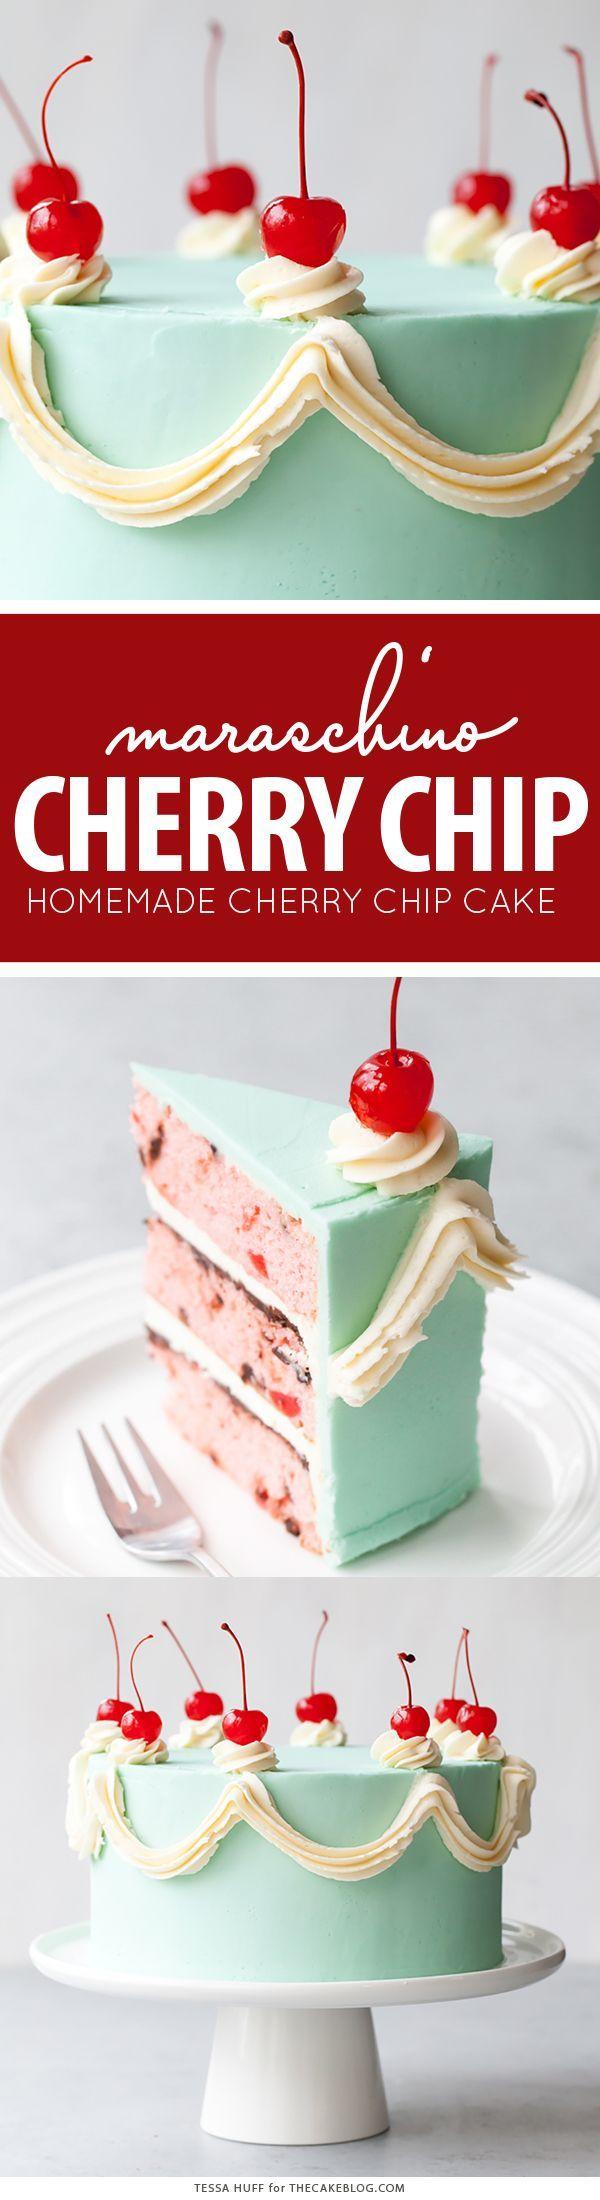 Cherry chip cake frosting recipe